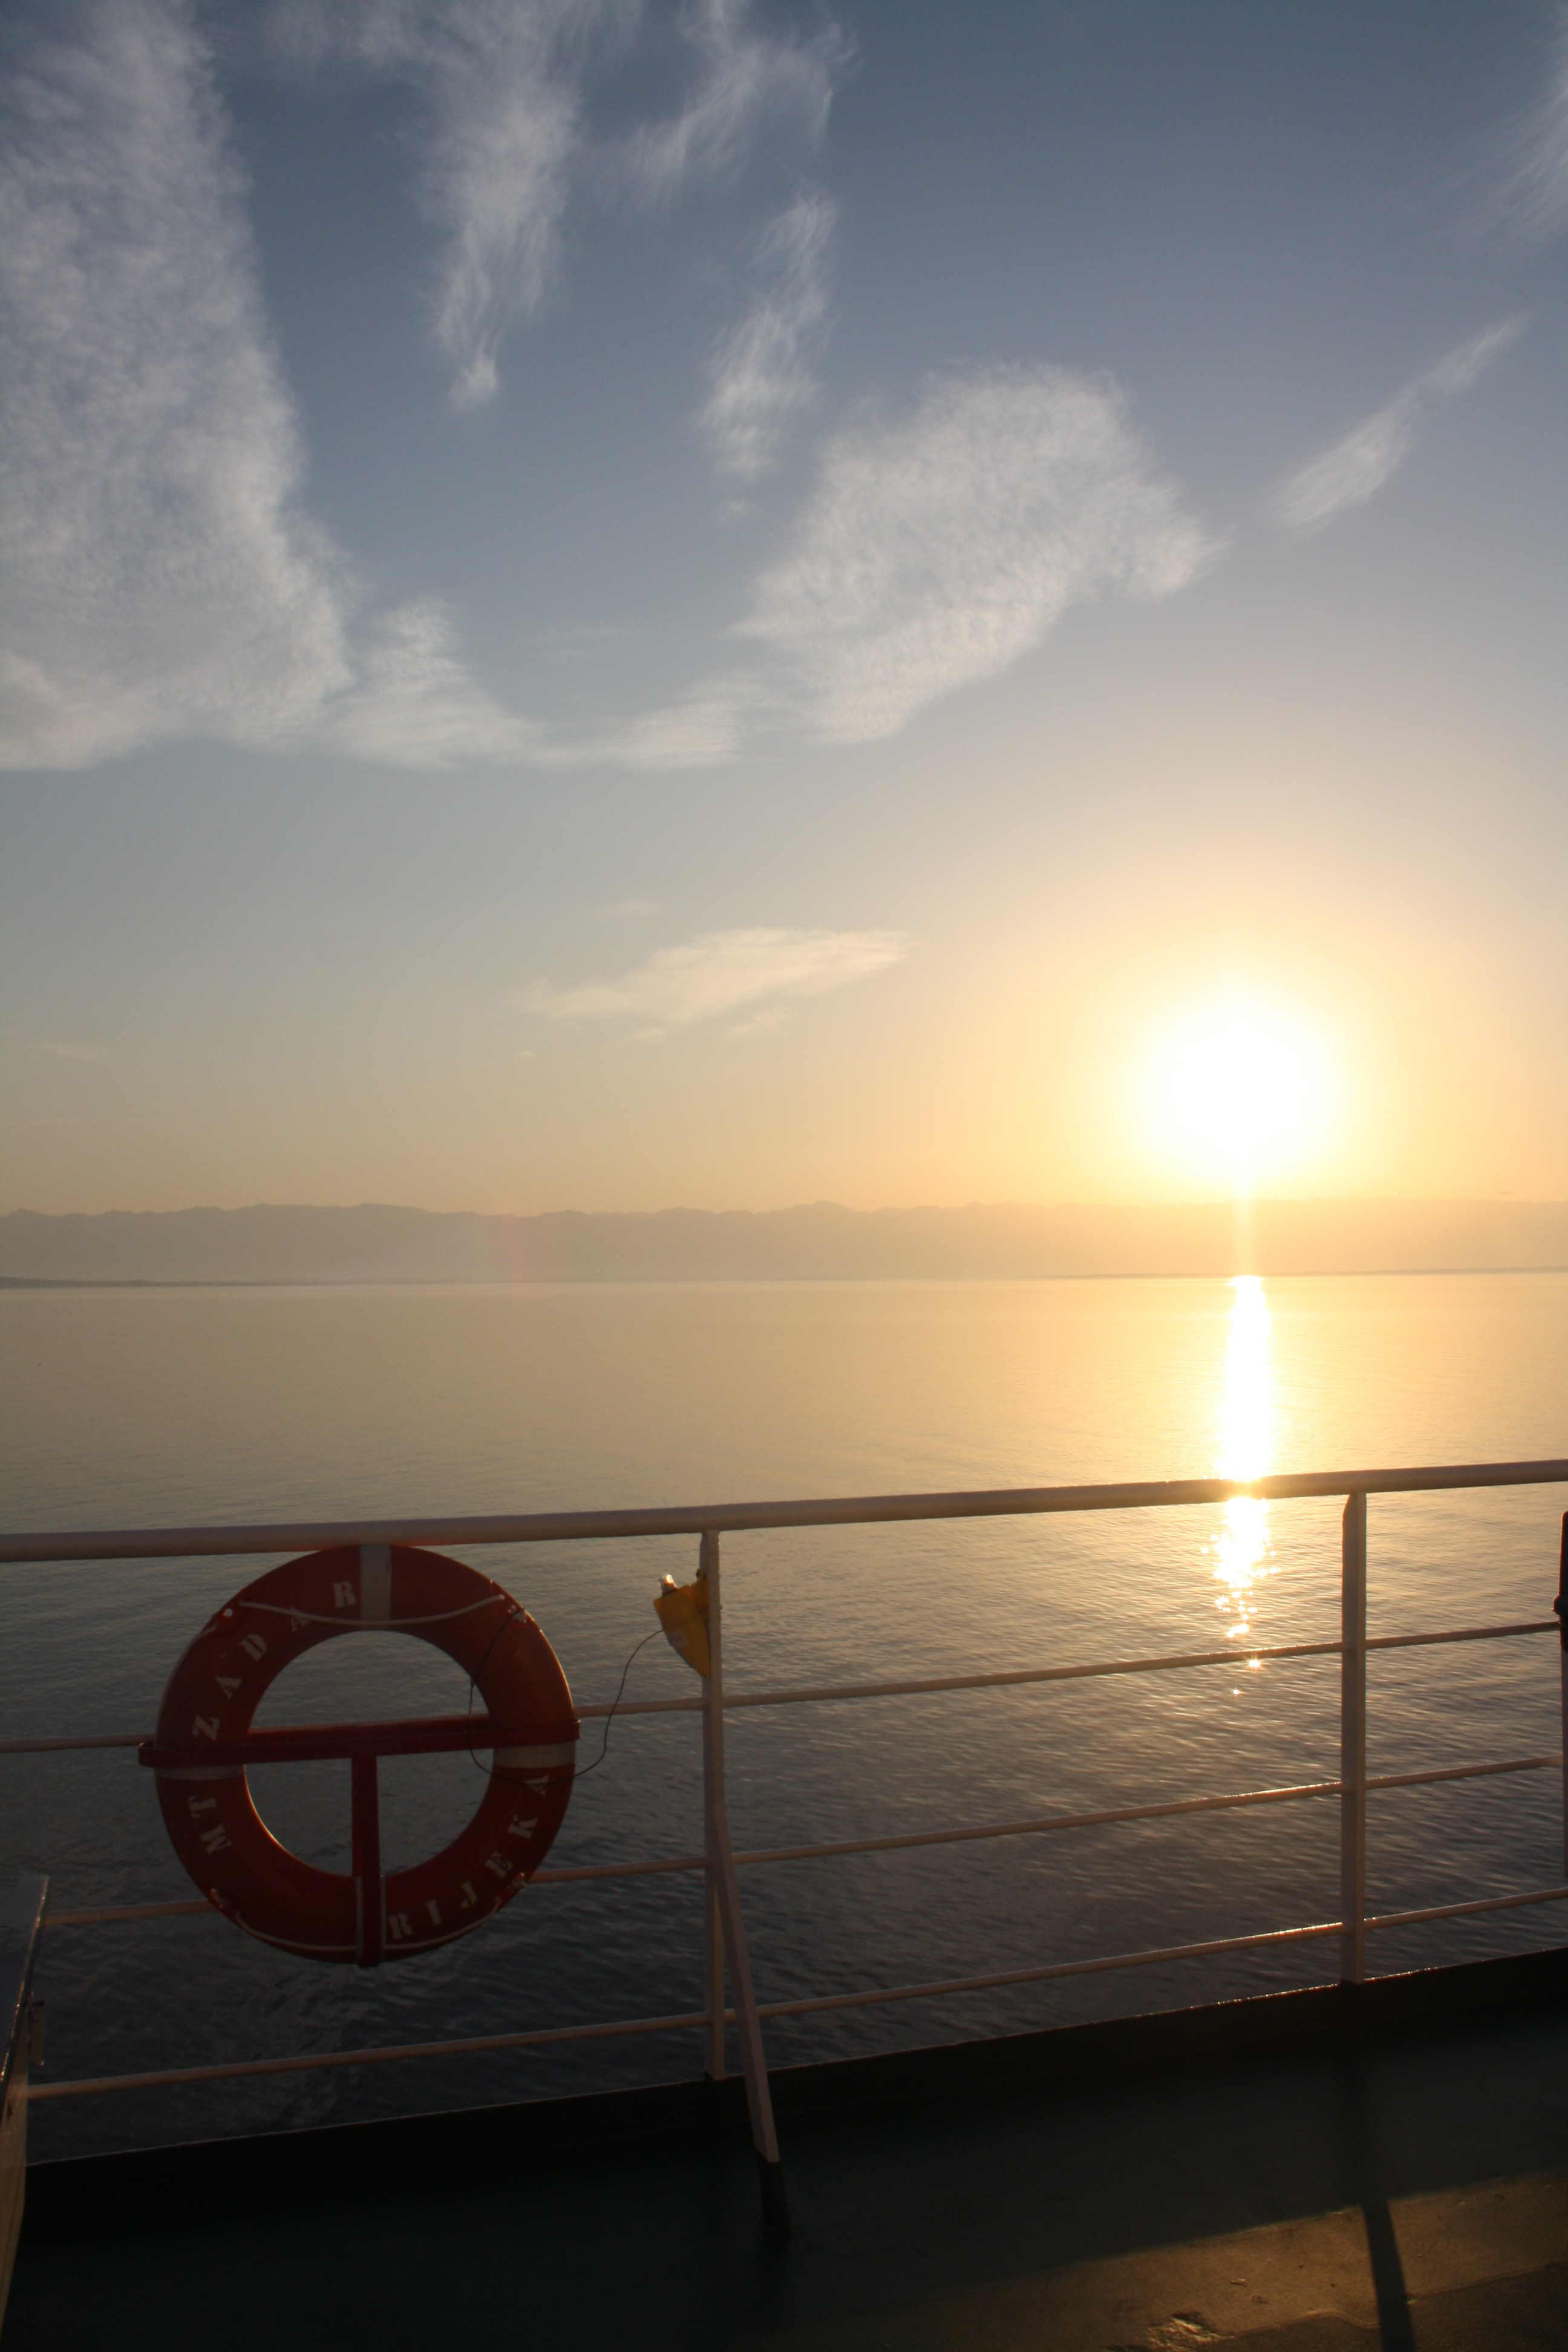 Ferry crossing Italy to Croatia